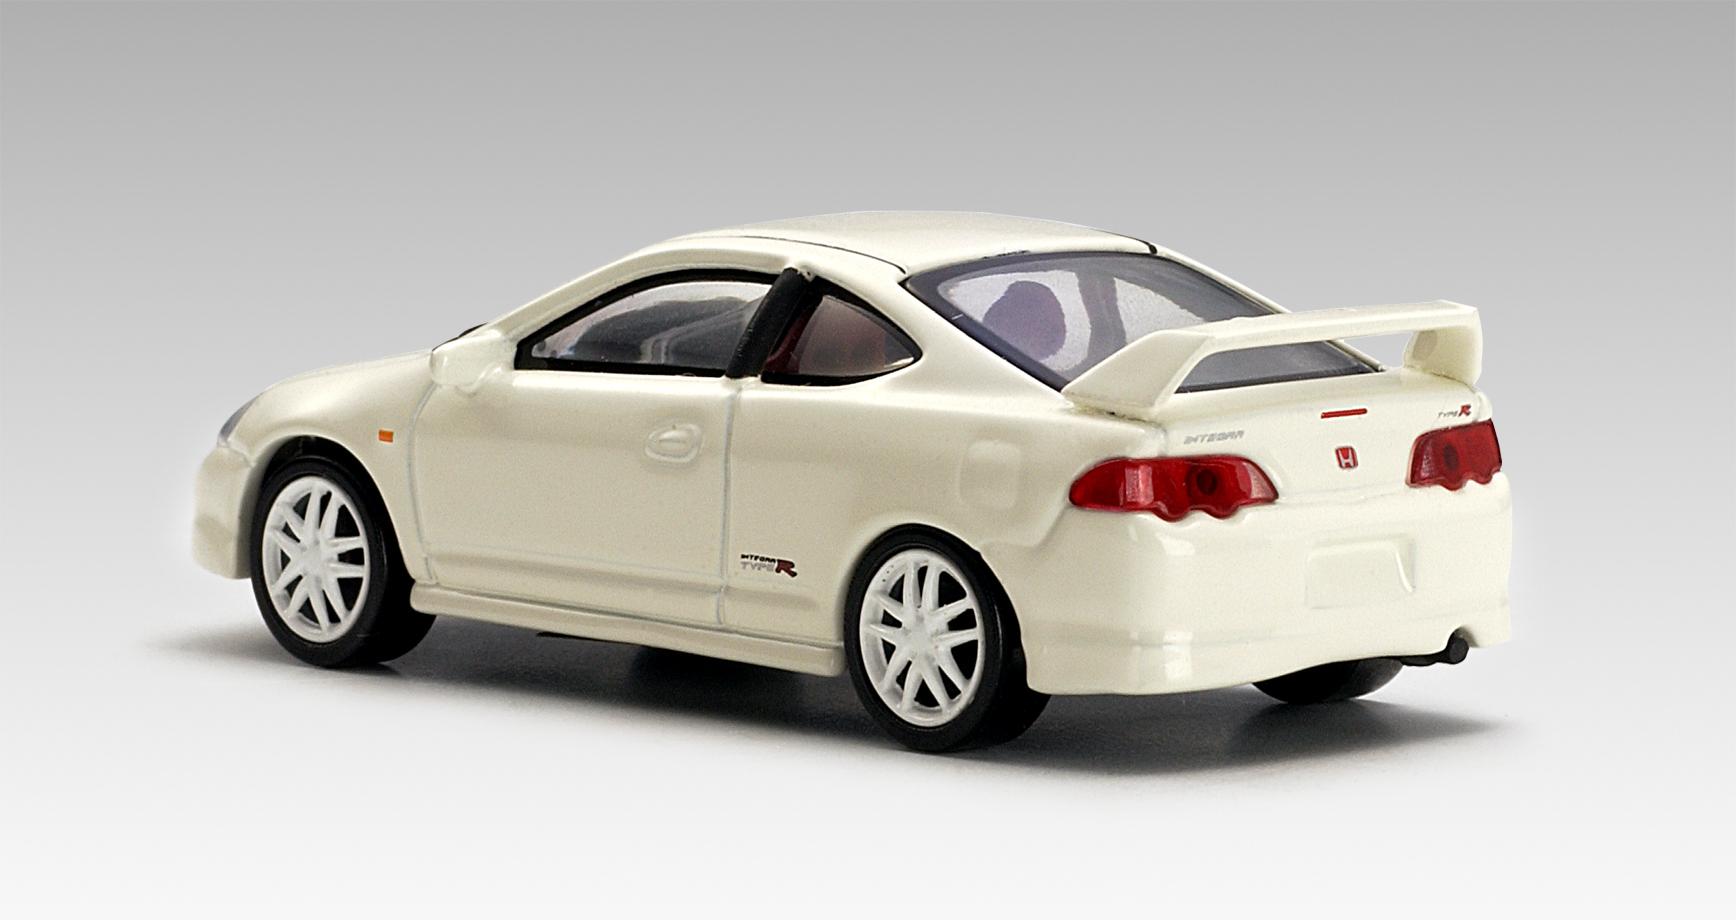 autoart honda integra type r white 20251 in 1 64 scale mdiecast